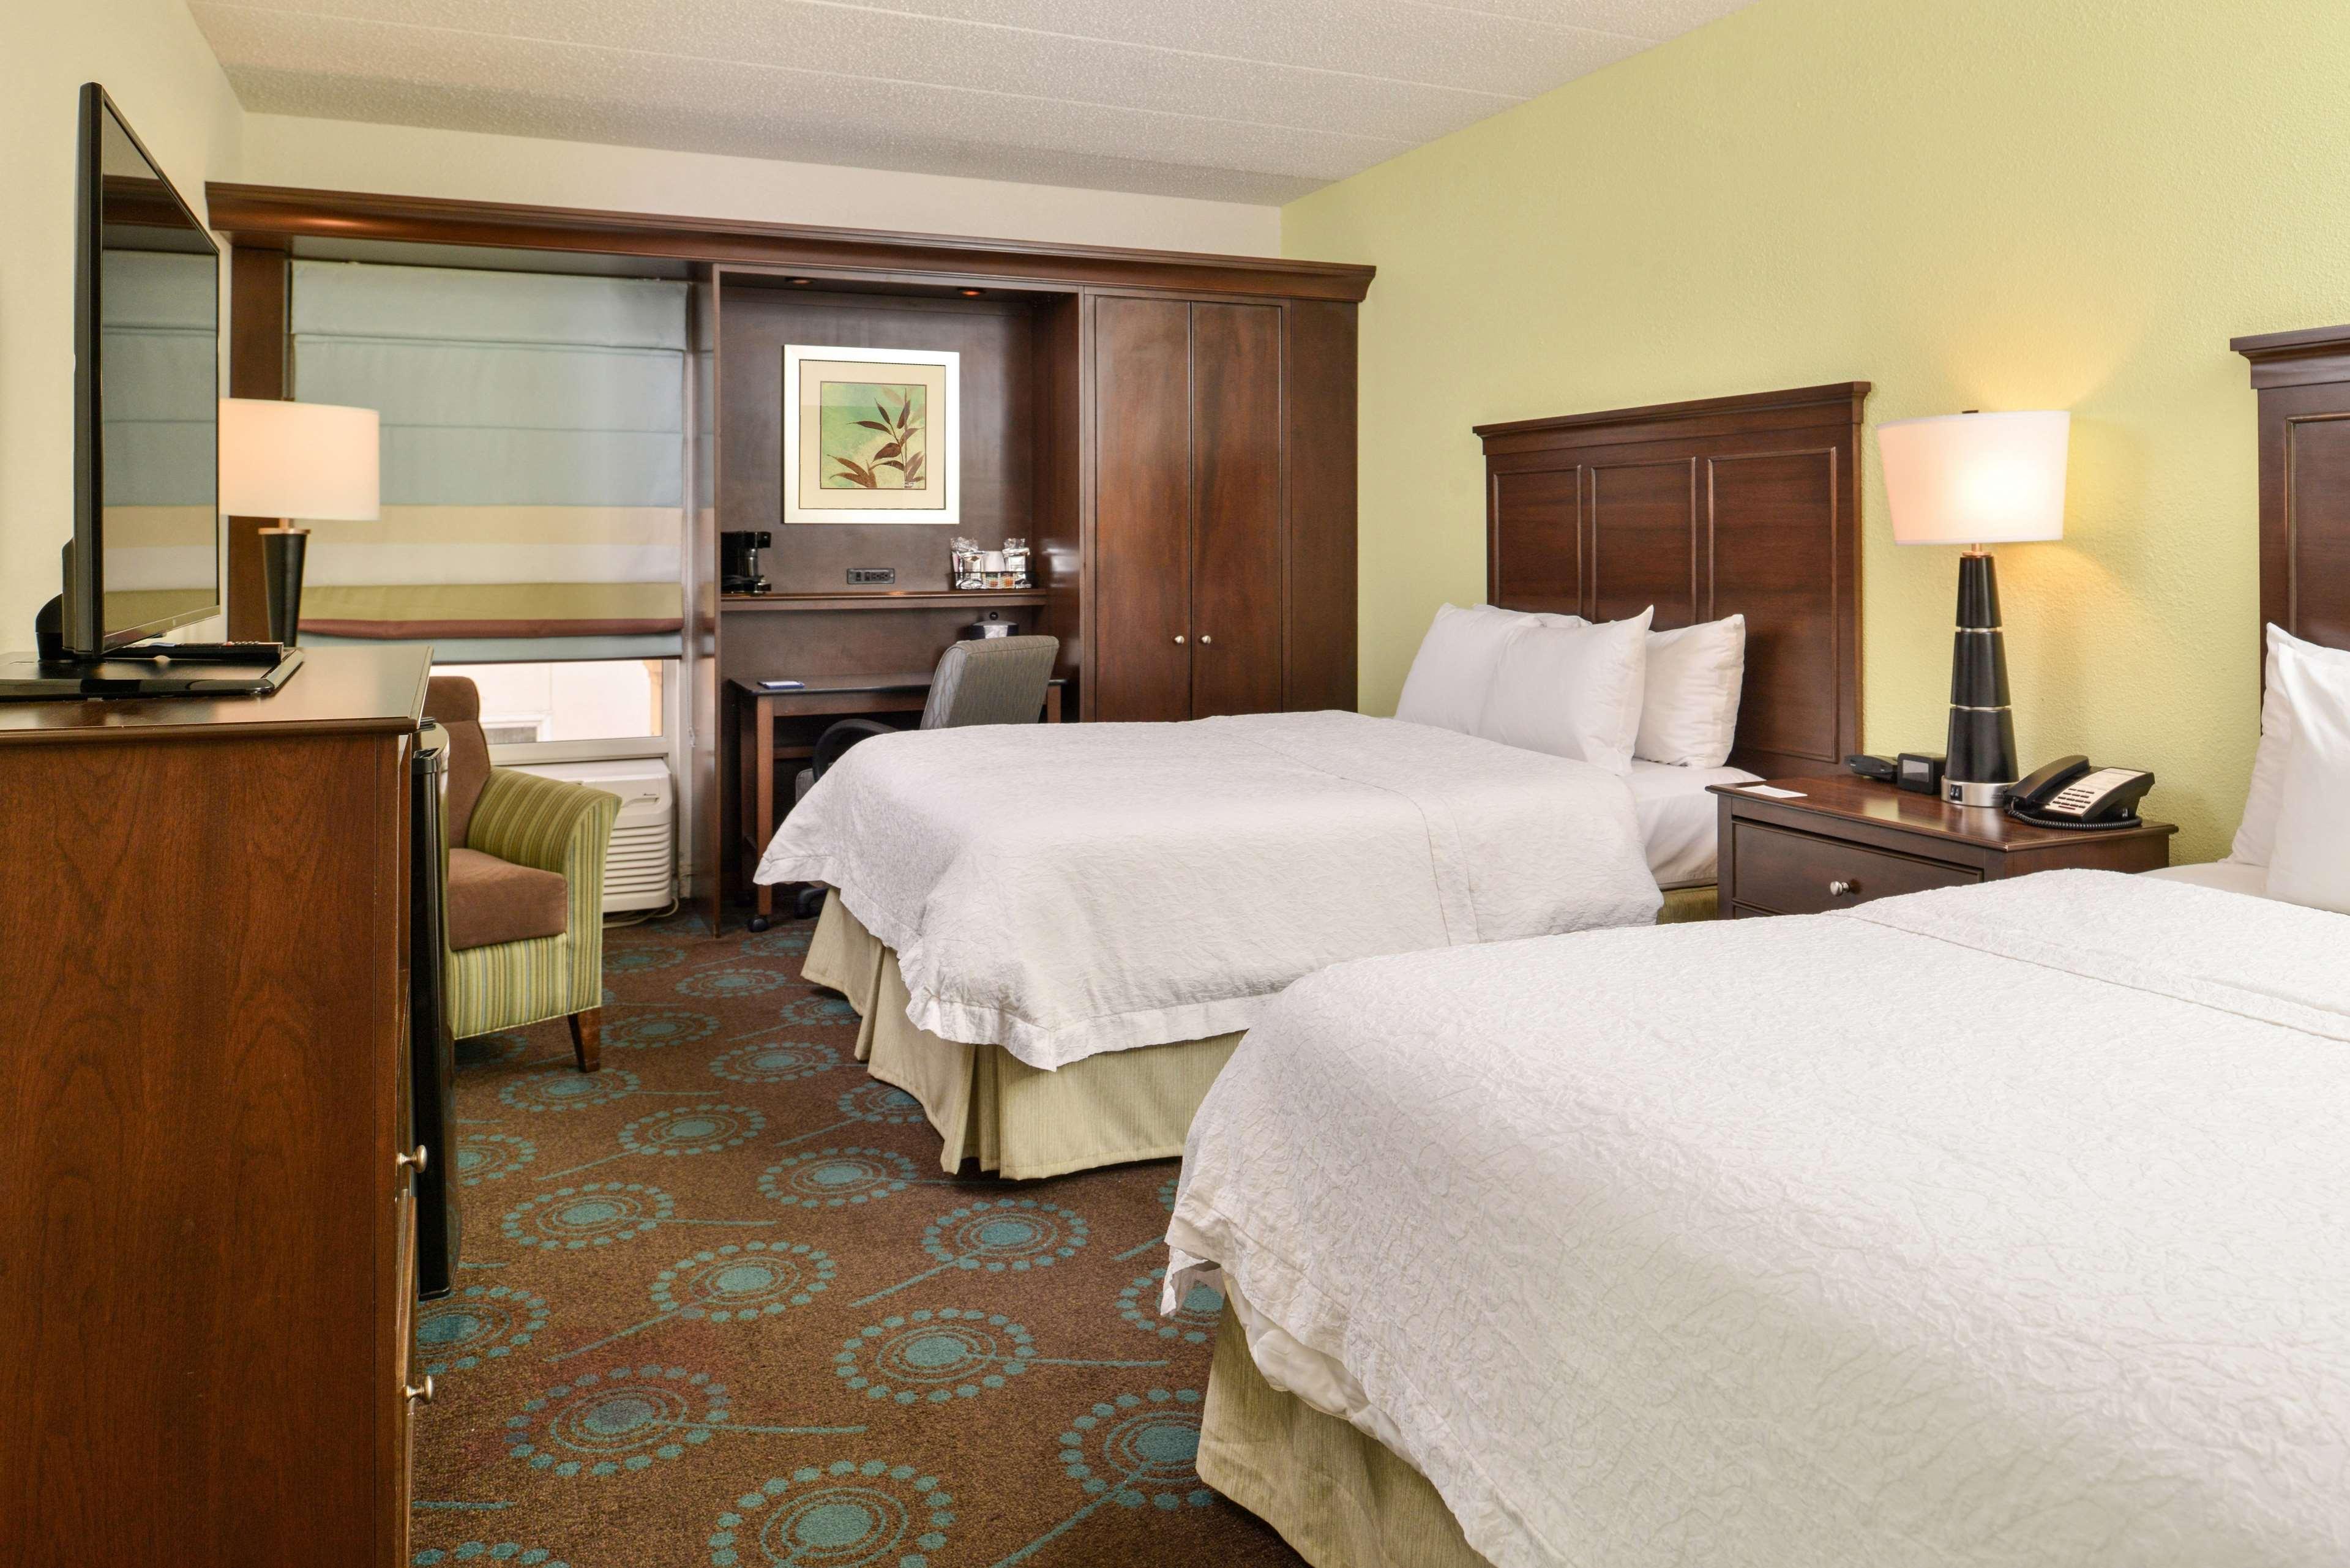 Hampton Inn & Suites Newport News (Oyster Point) image 18